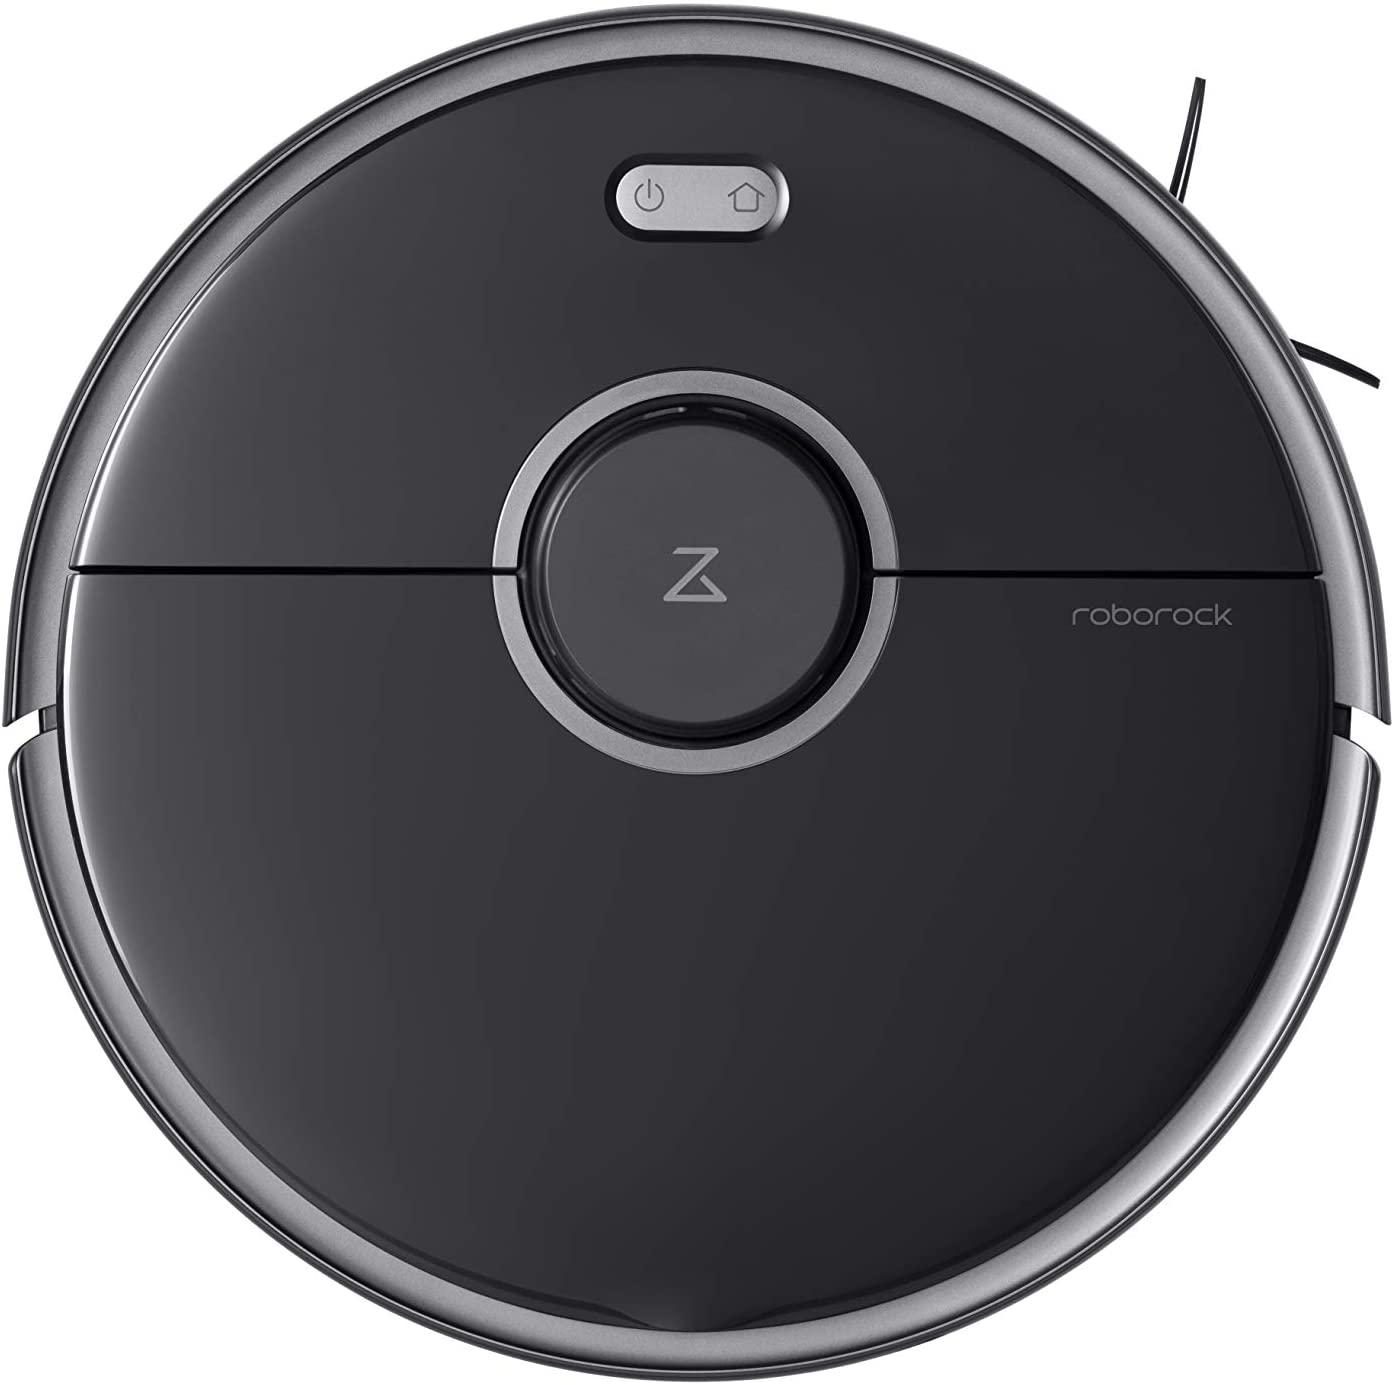 Roborock S5 MAX Robot Vacuum and Mop Cleaner, Self-Charging Robotic Vacuum, Lidar Navigation, Selective Room Cleaning, No-mop Zones with Alexa (Black)